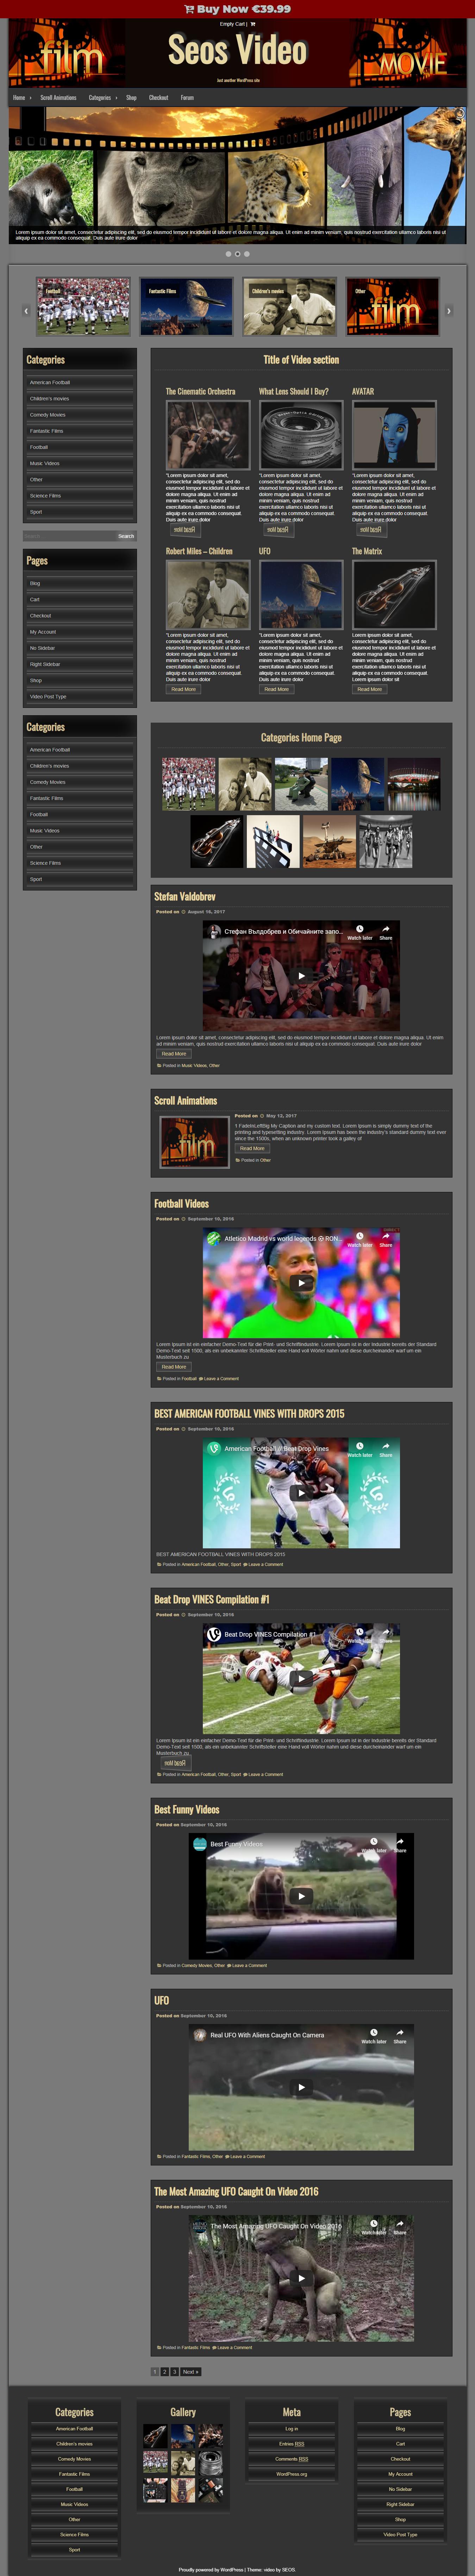 seos video best free video and music wordpress theme - 10+ Best Free Video and Music WordPress Themes